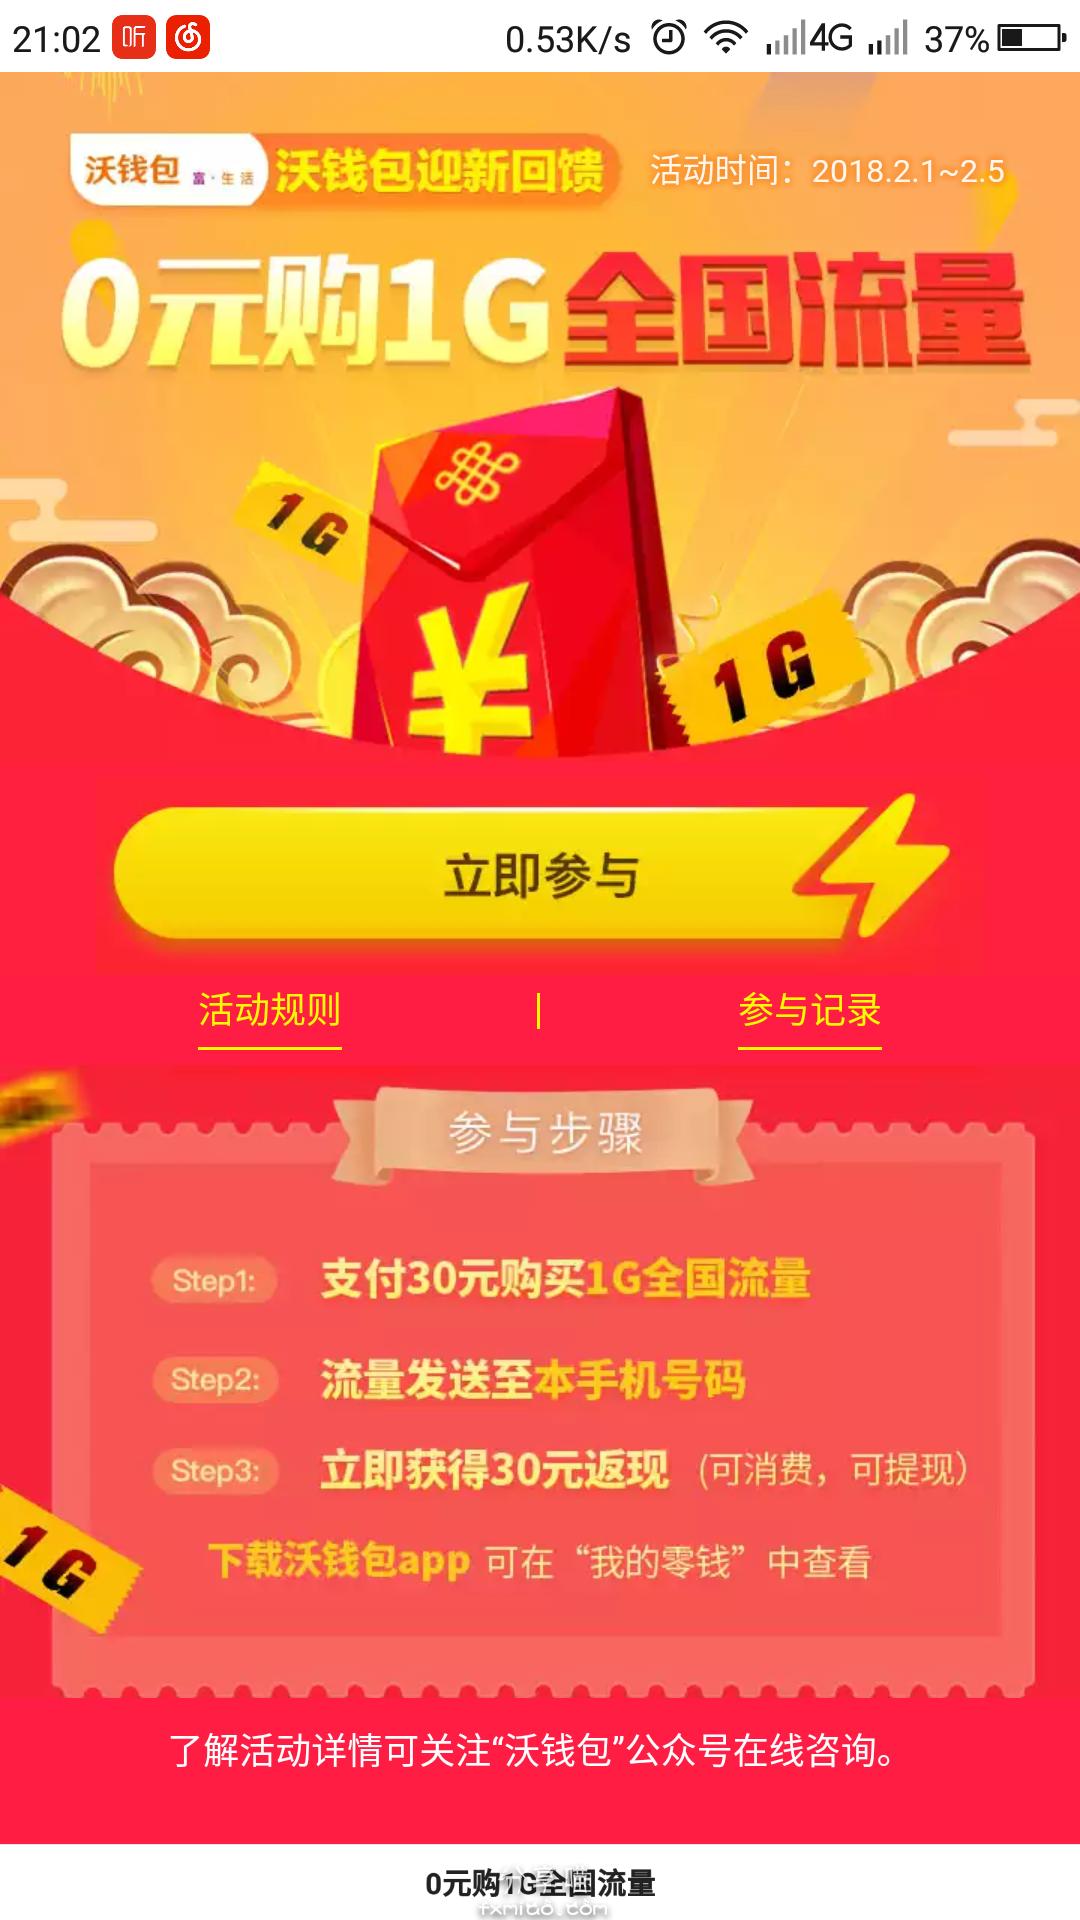 Screenshot 2018 02 02 21 02 28 - 中国联通送流量-论腾讯王卡的正确使用方式